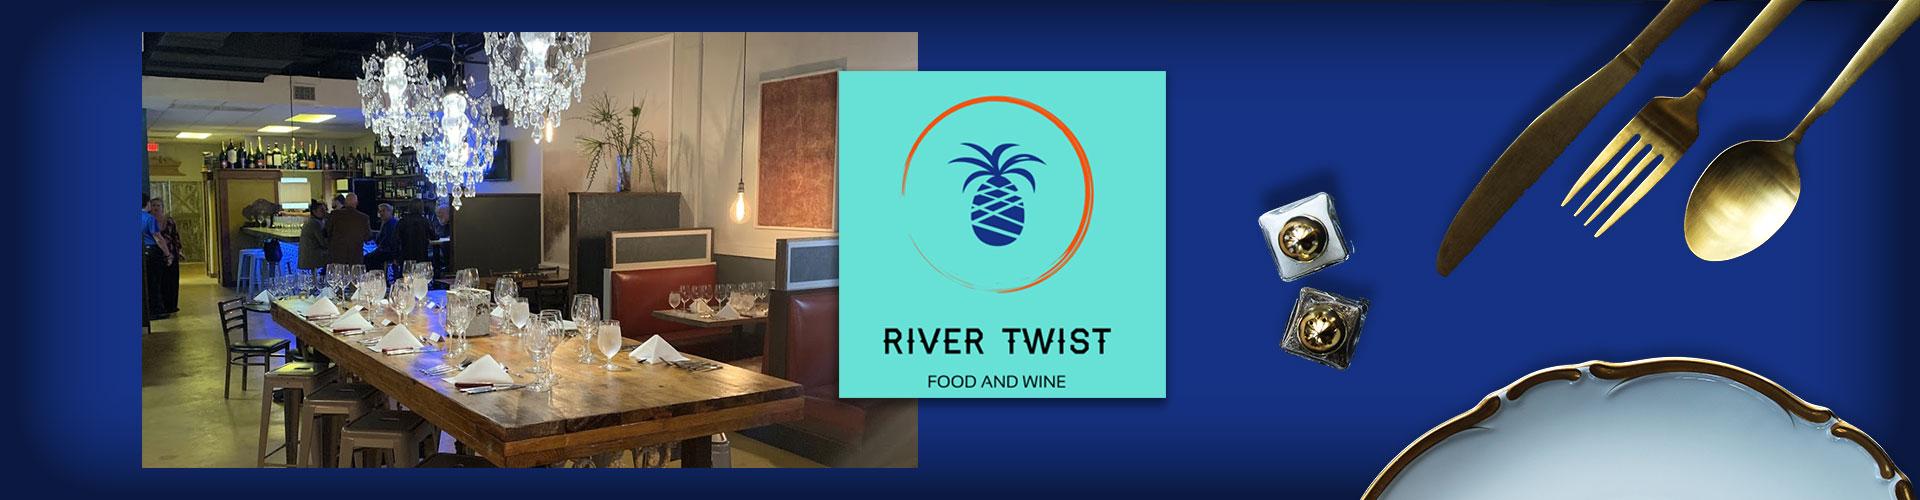 spring dinner river twist